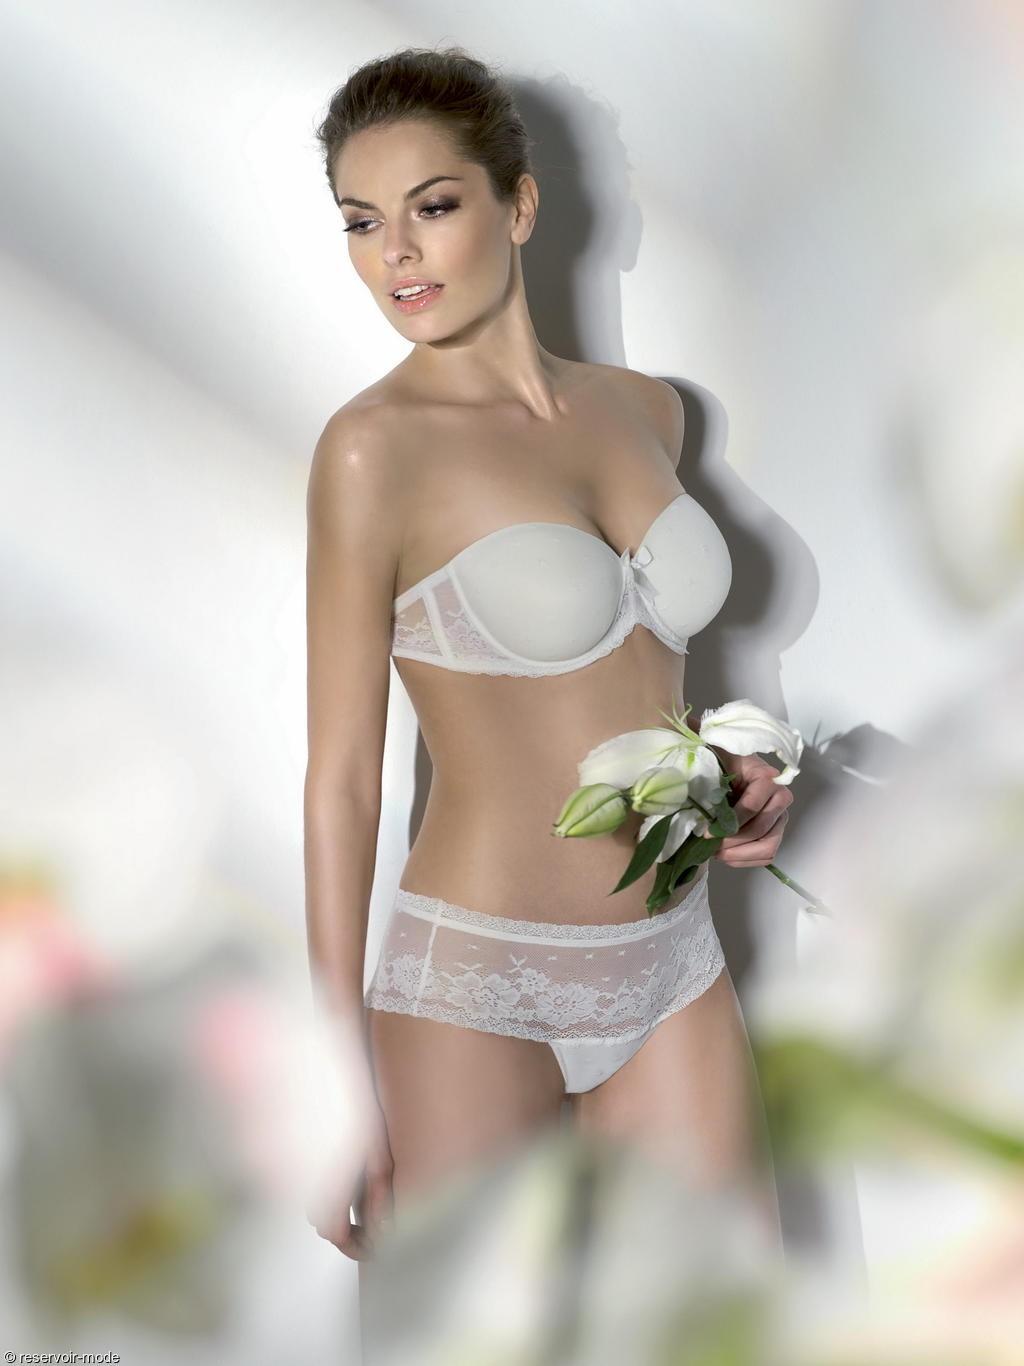 soutien gorge mariage bandeau valentina lingerie mariage. Black Bedroom Furniture Sets. Home Design Ideas